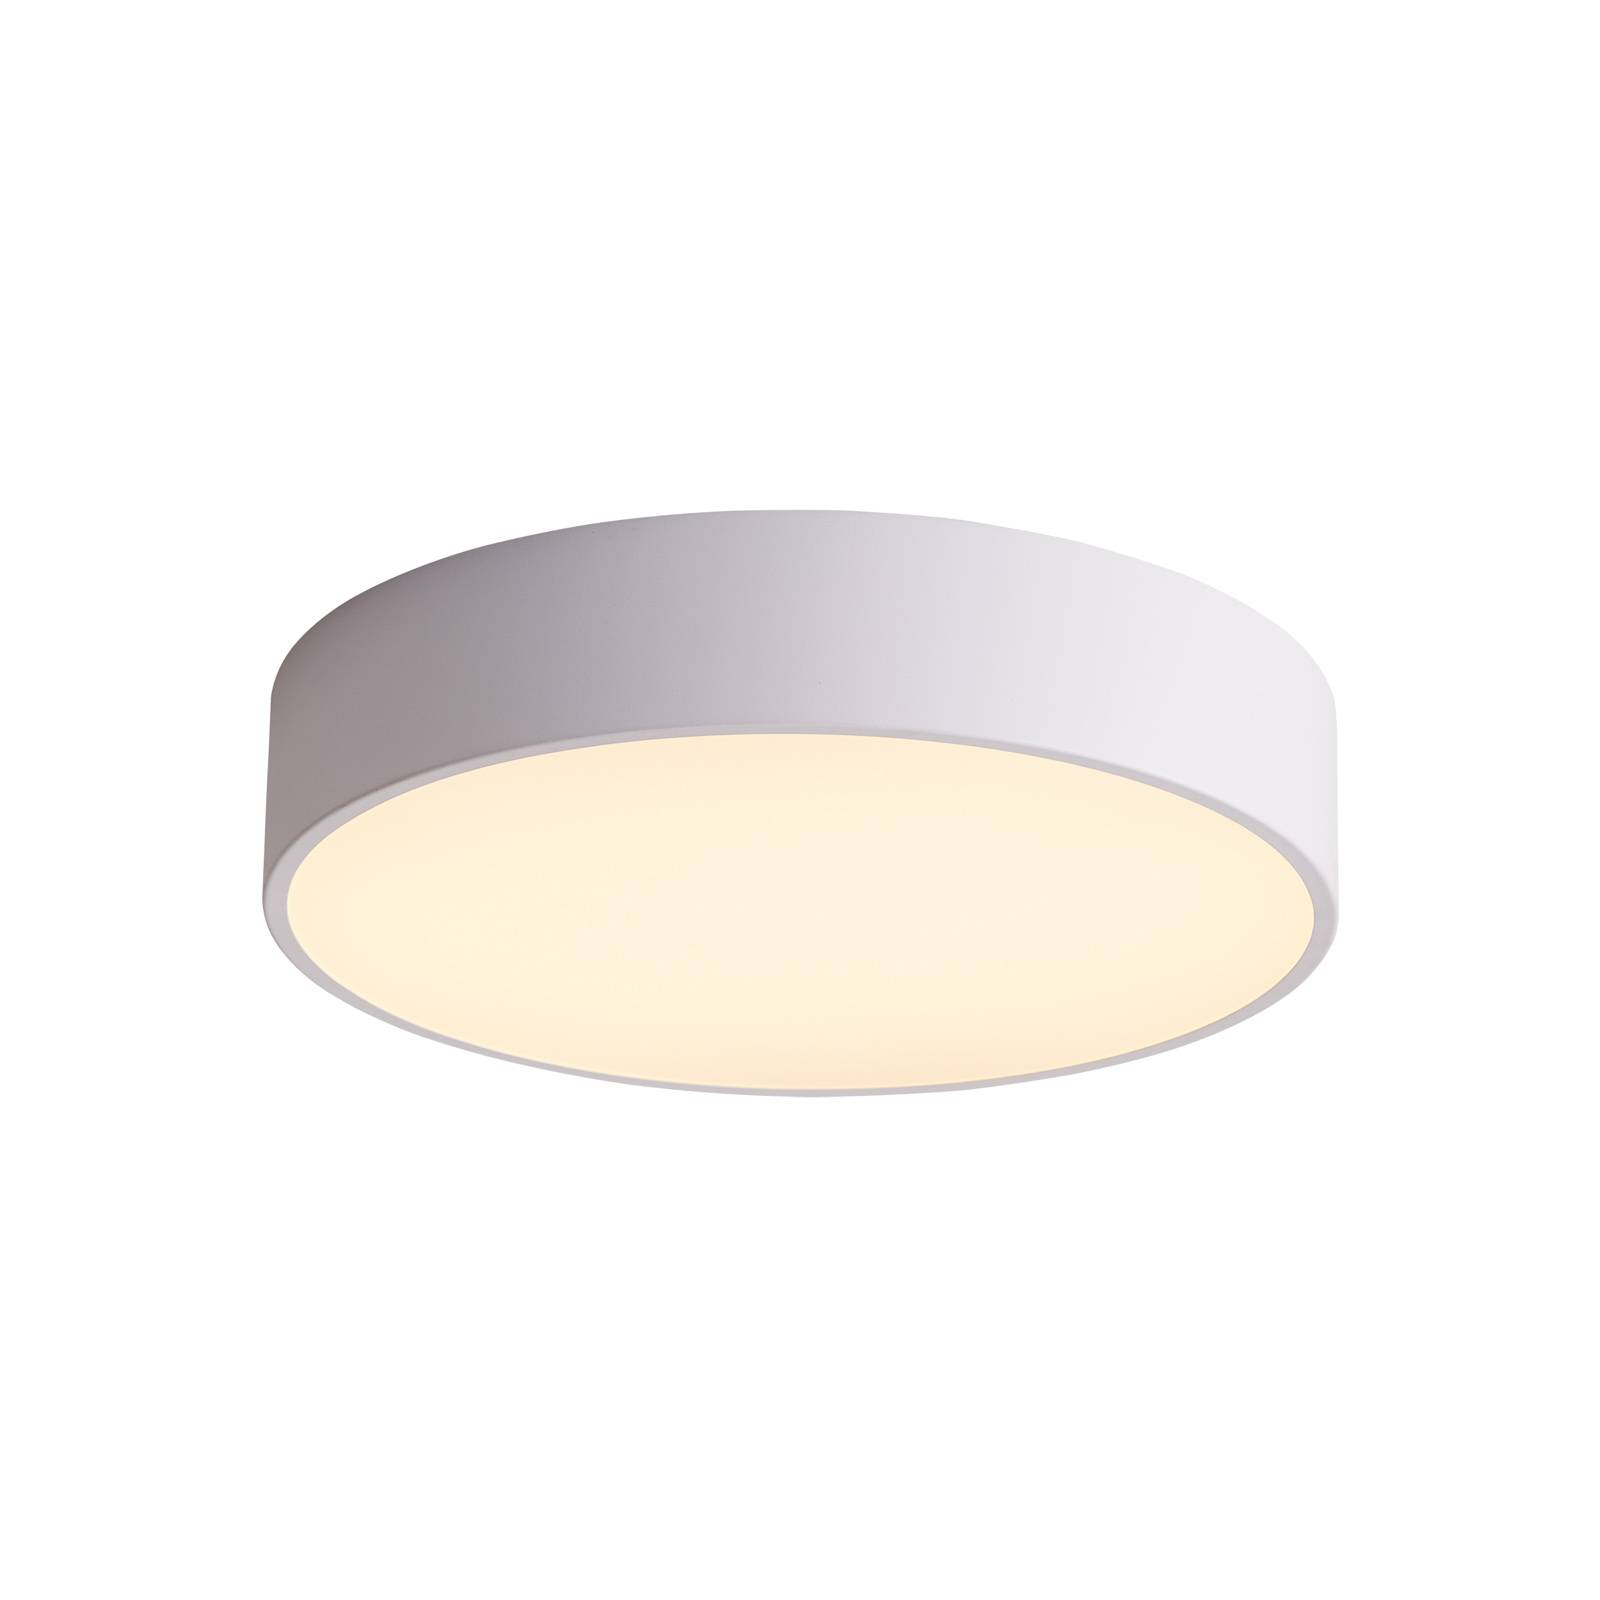 Arcchio Noabelle -LED-kattovalaisin, 60 cm